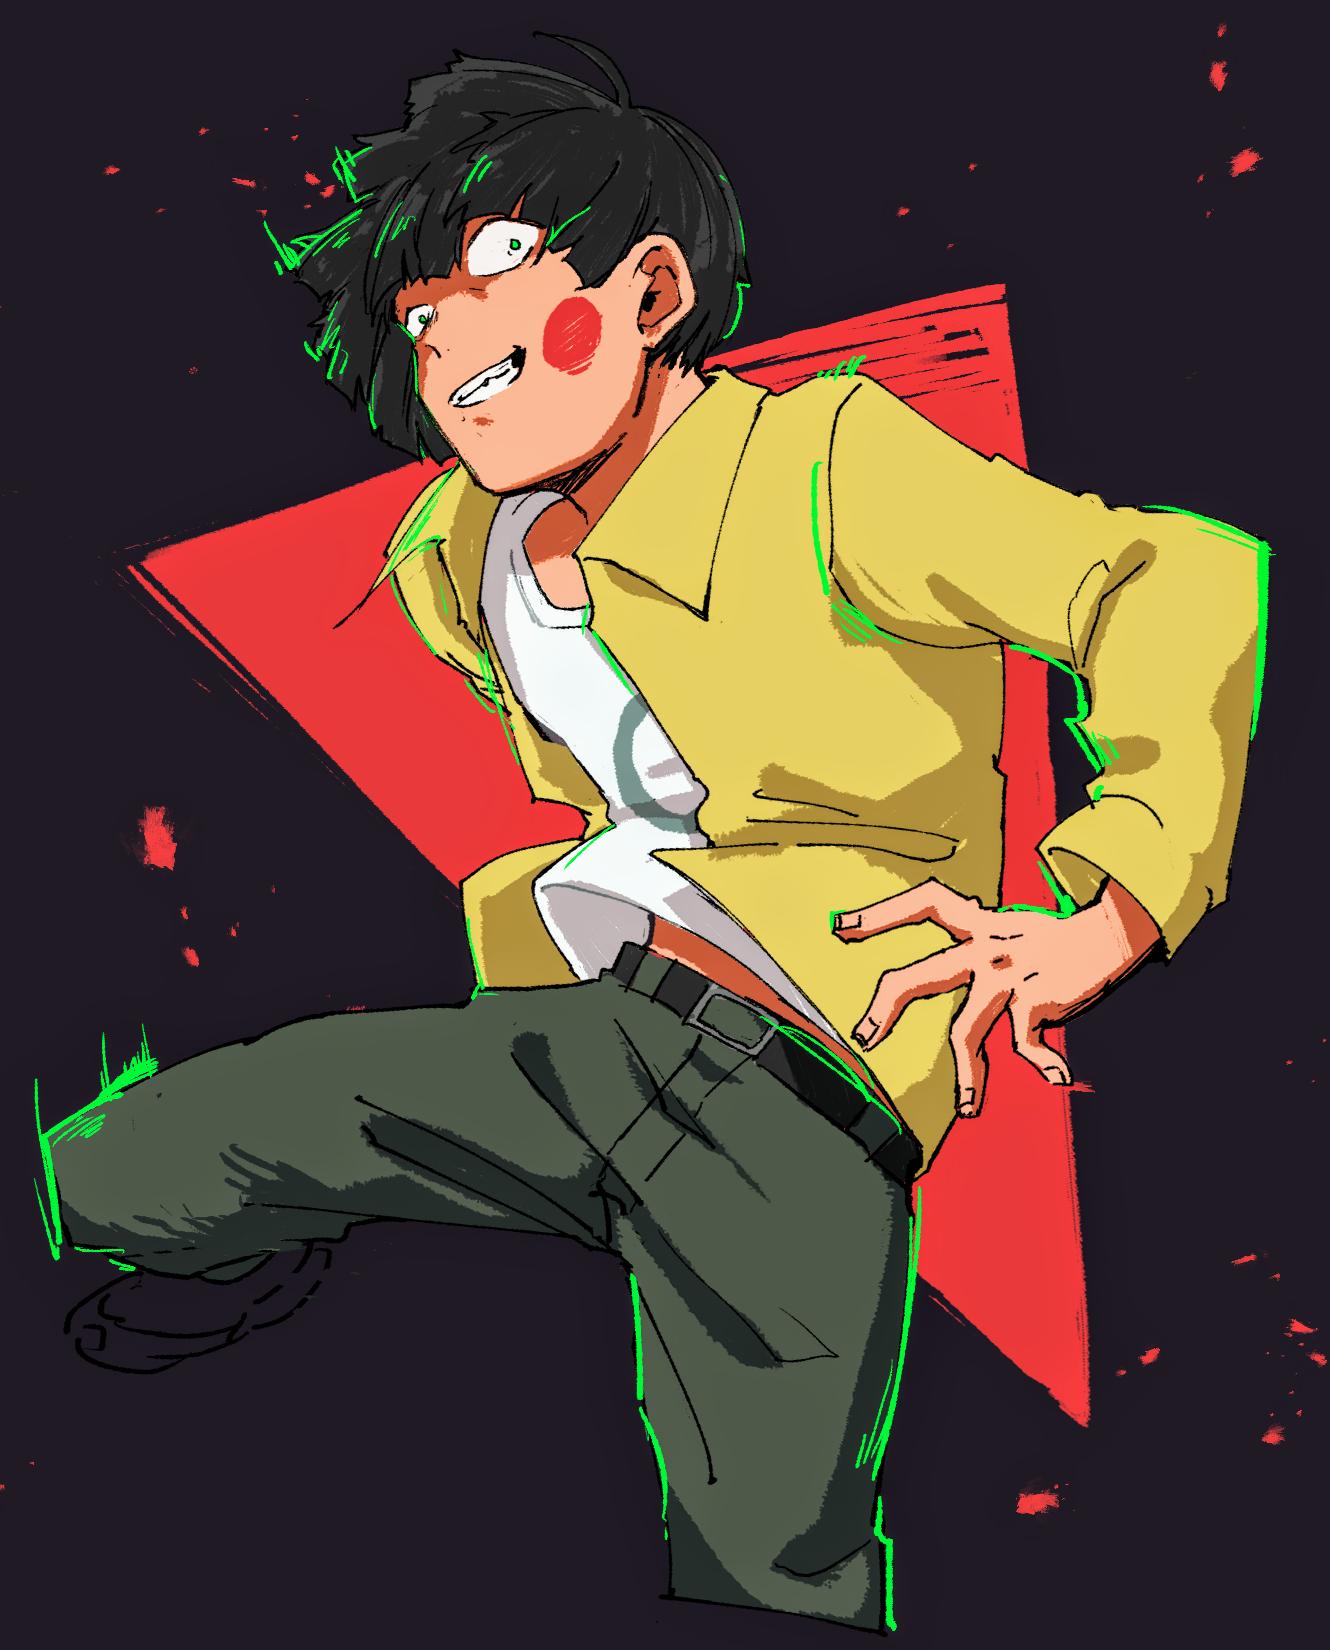 Dimple╳Mob Psycho 100 Art Fanart Anime Manga Animeboy